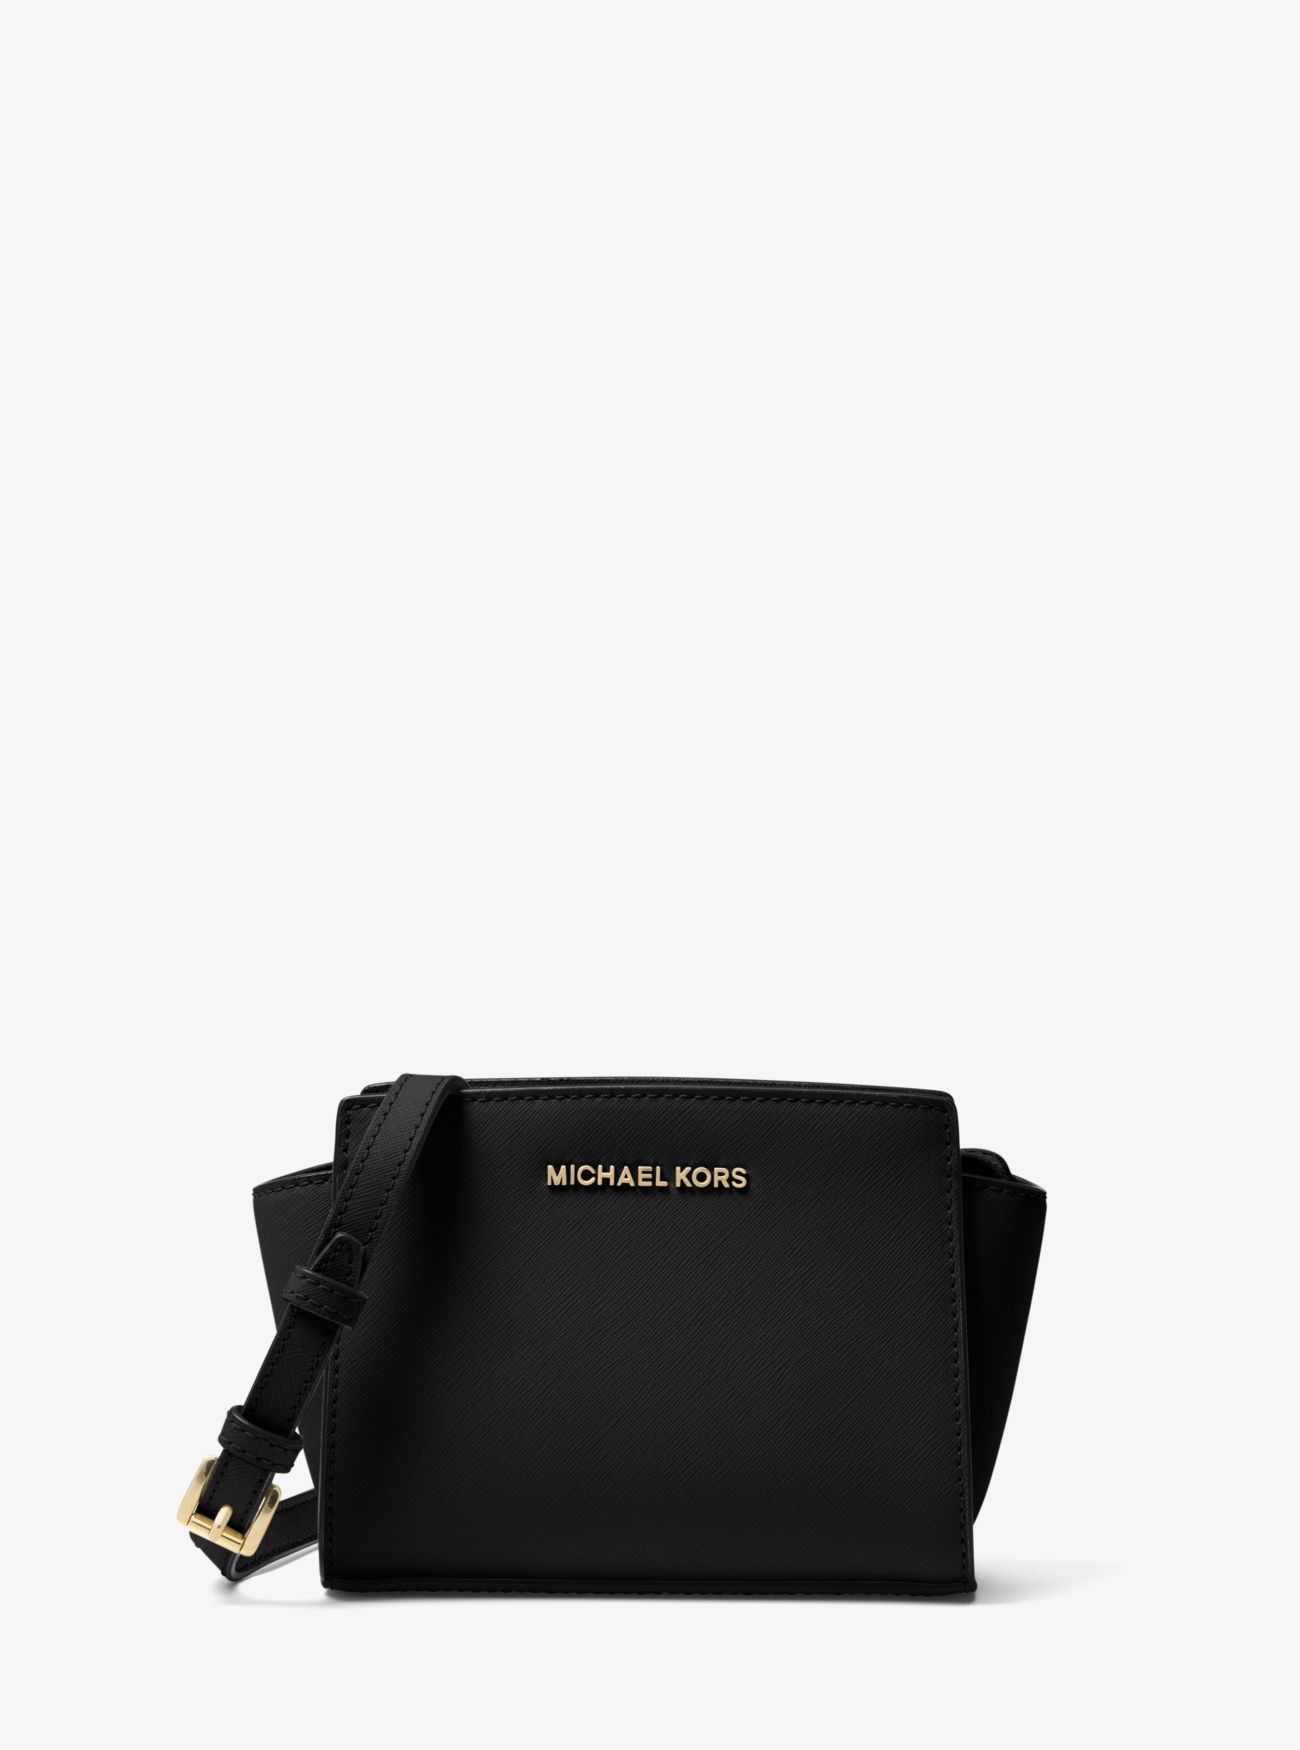 156a1302e607e Price Michael Kors Black Selma Mini Saffiano Leather Crossbody Outlet Sale